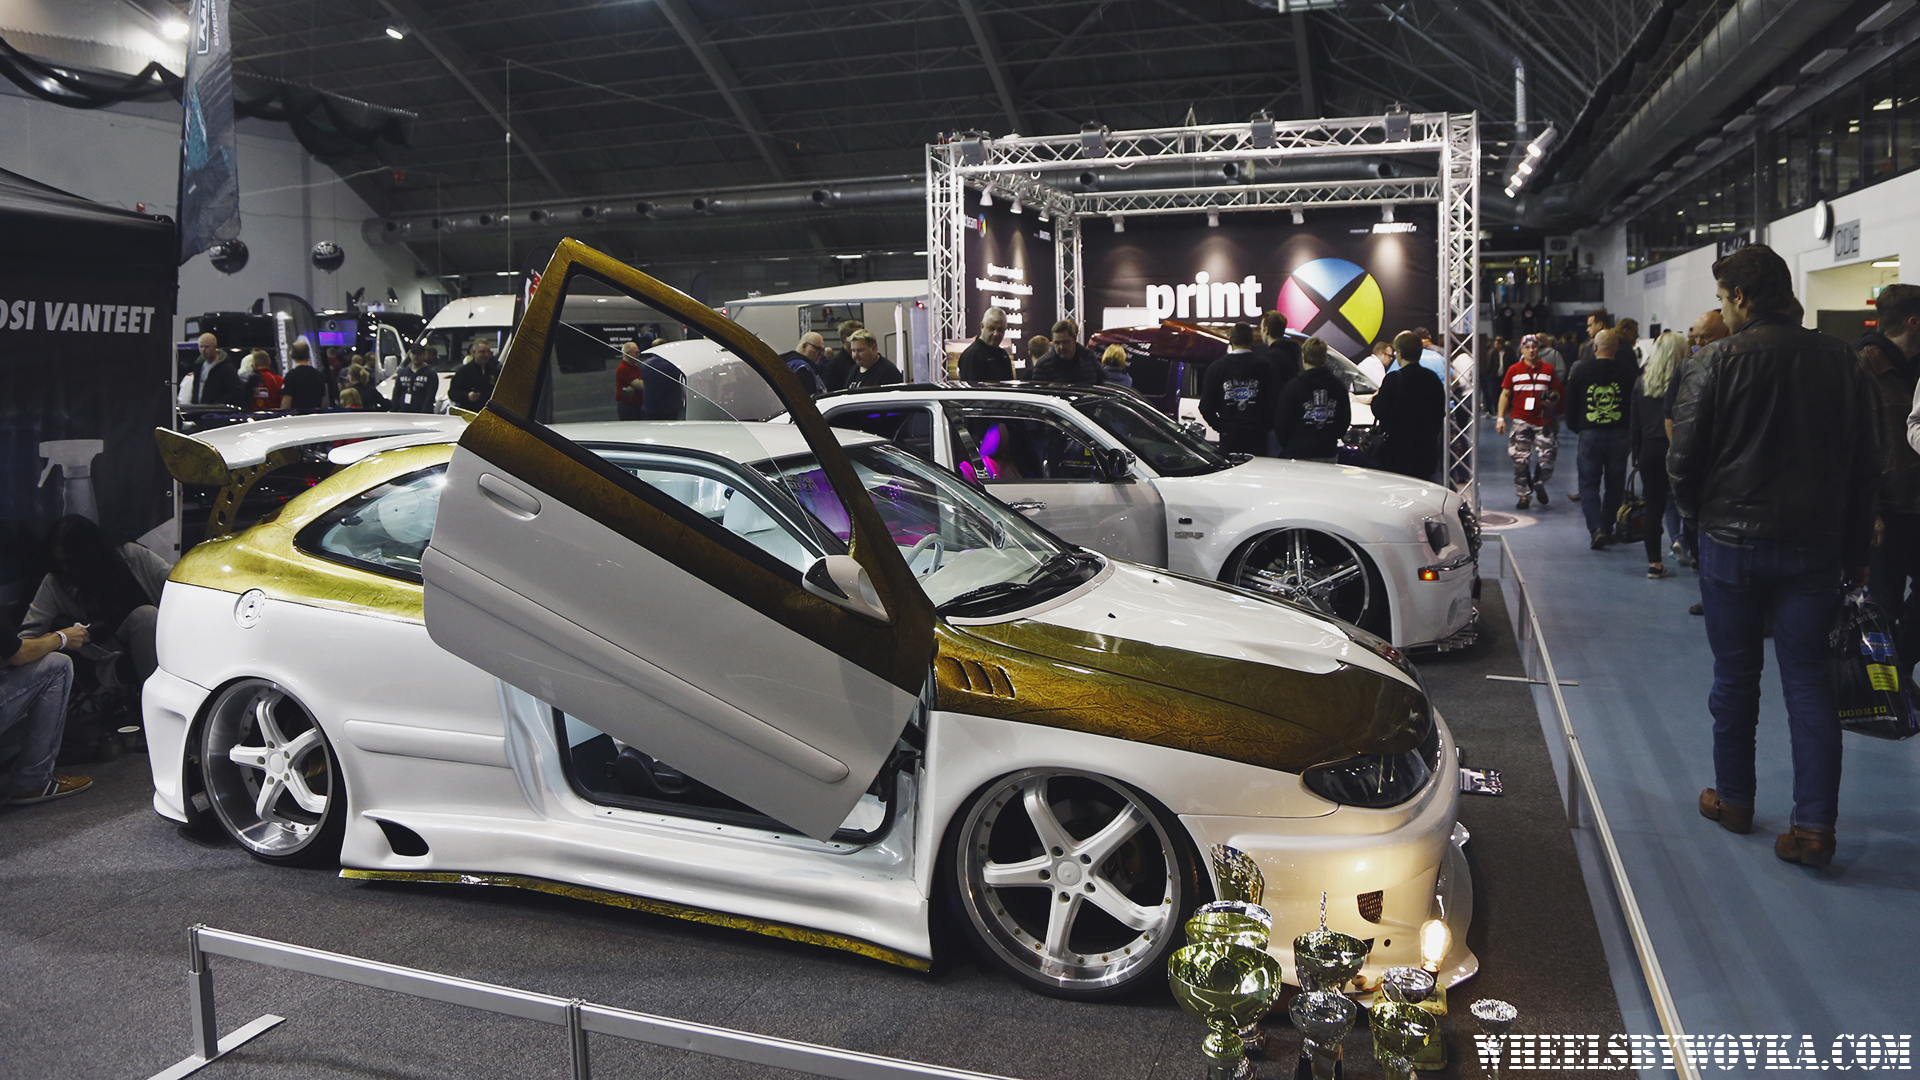 x-treme-car-show-lahti-2017-2